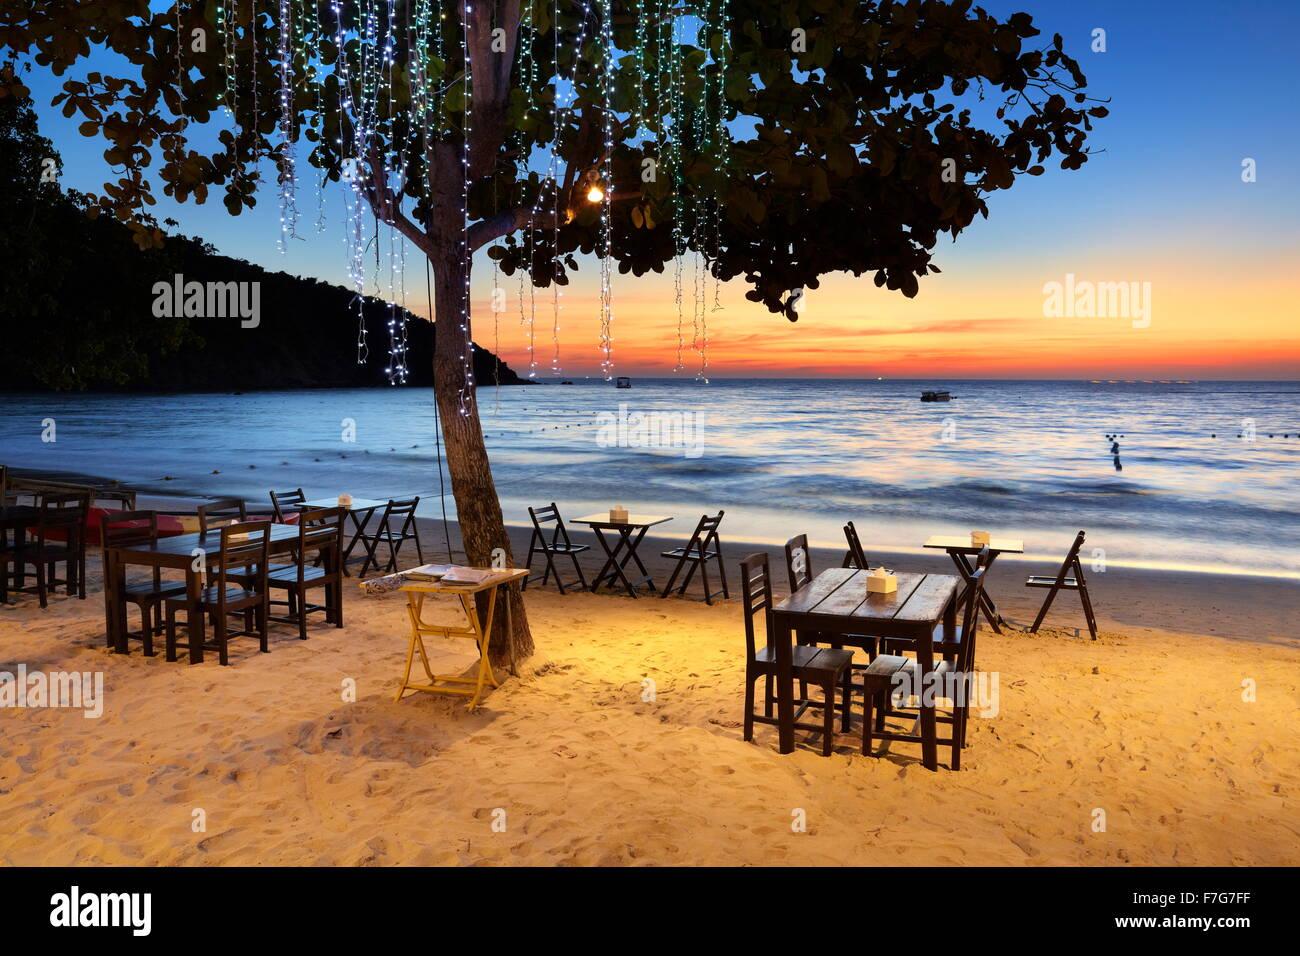 Restaurant am Strand bei Sonnenuntergang, Lima Coco Resort, Ko Samet Insel, Thailand Stockbild